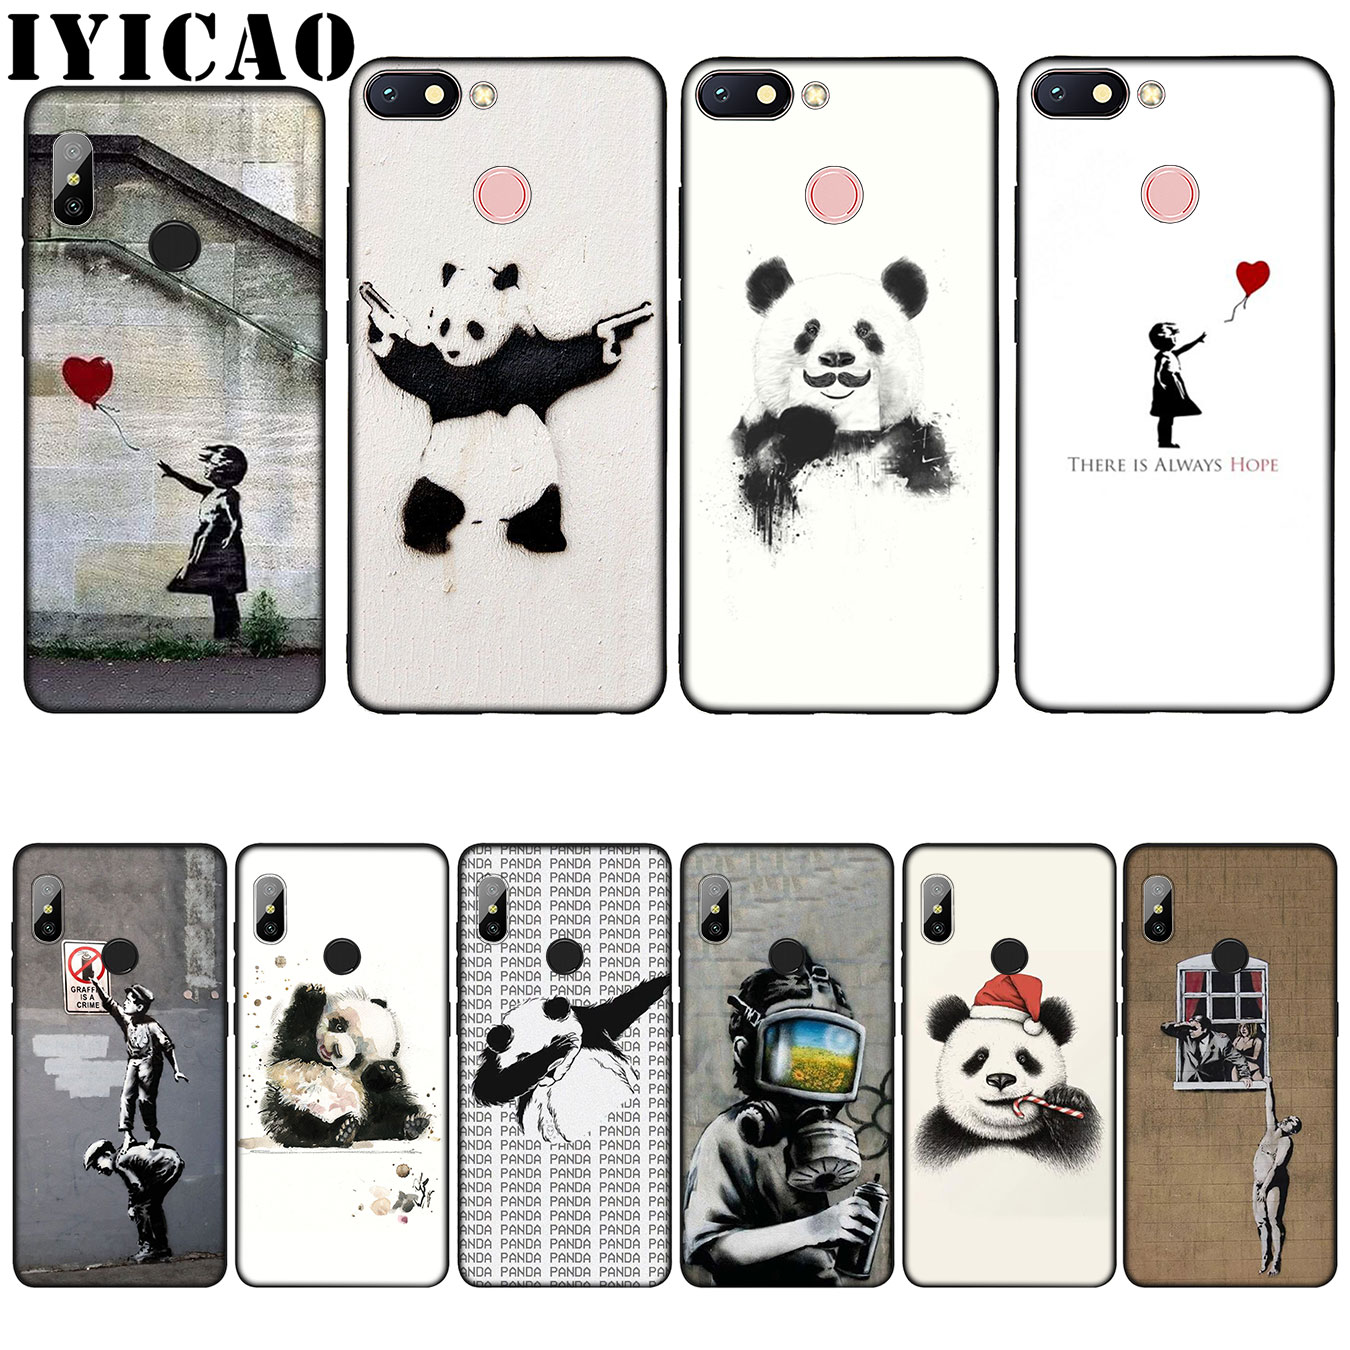 IYICAO arte de la calle Banksy Graffiti Panda suave de silicona caso para Xiaomi Redmi 6A 5A Nota 8 7 4 4X 5 6 Plus Pro negro de la cubierta del TPU del